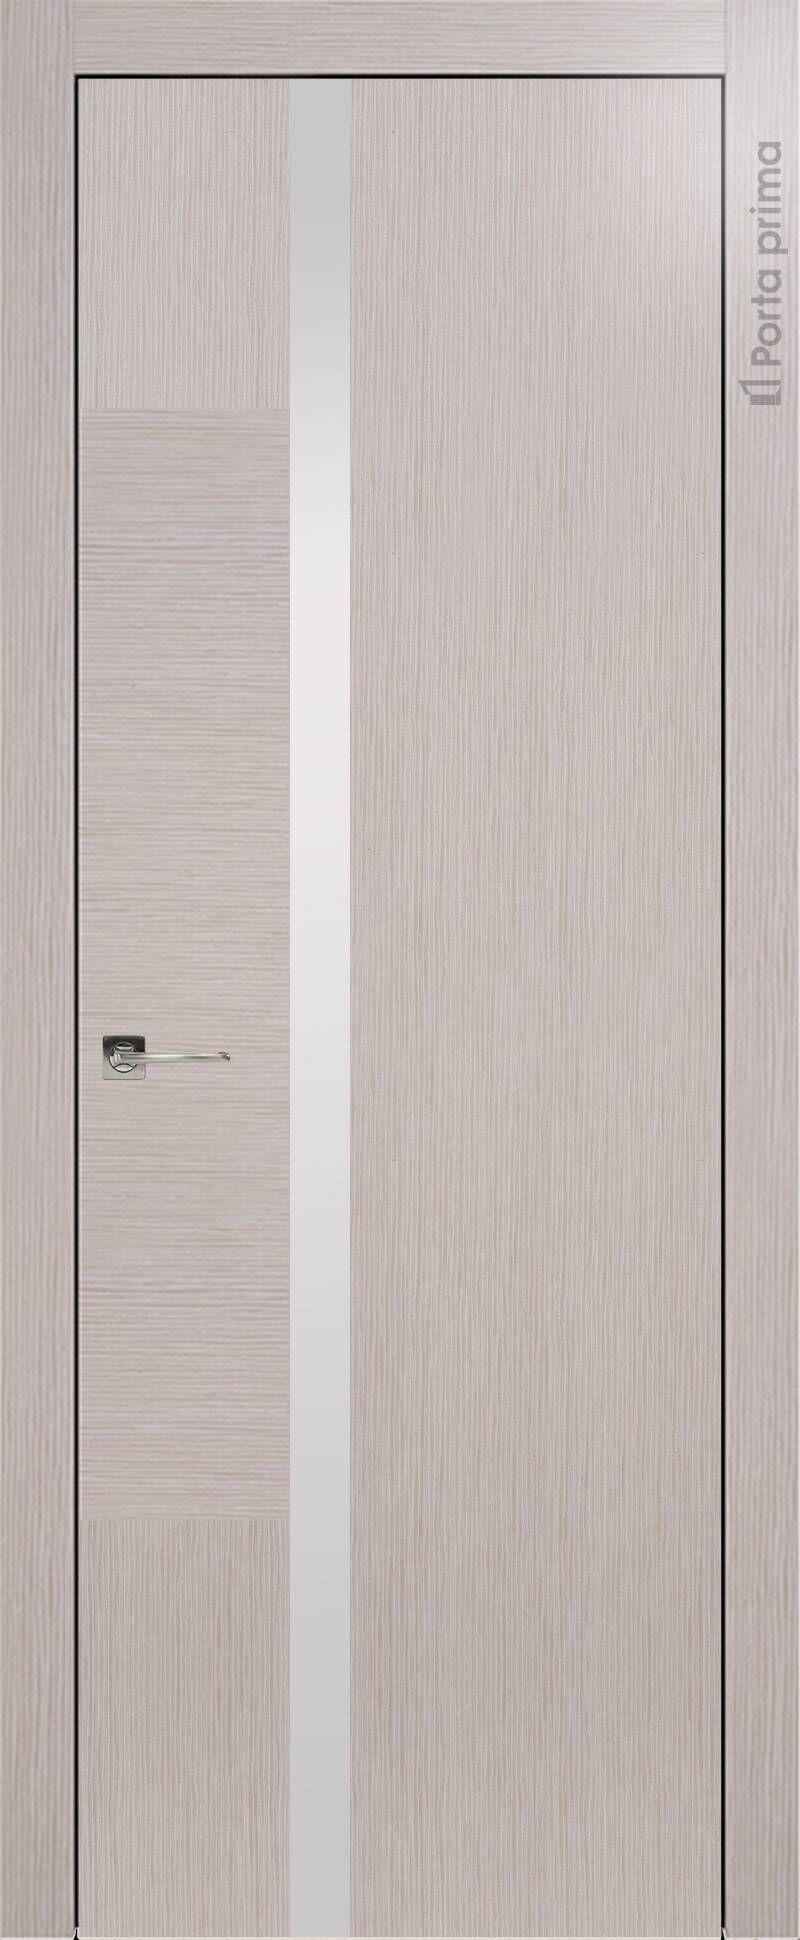 Tivoli Д-1 цвет - Дымчатый дуб Без стекла (ДГ)